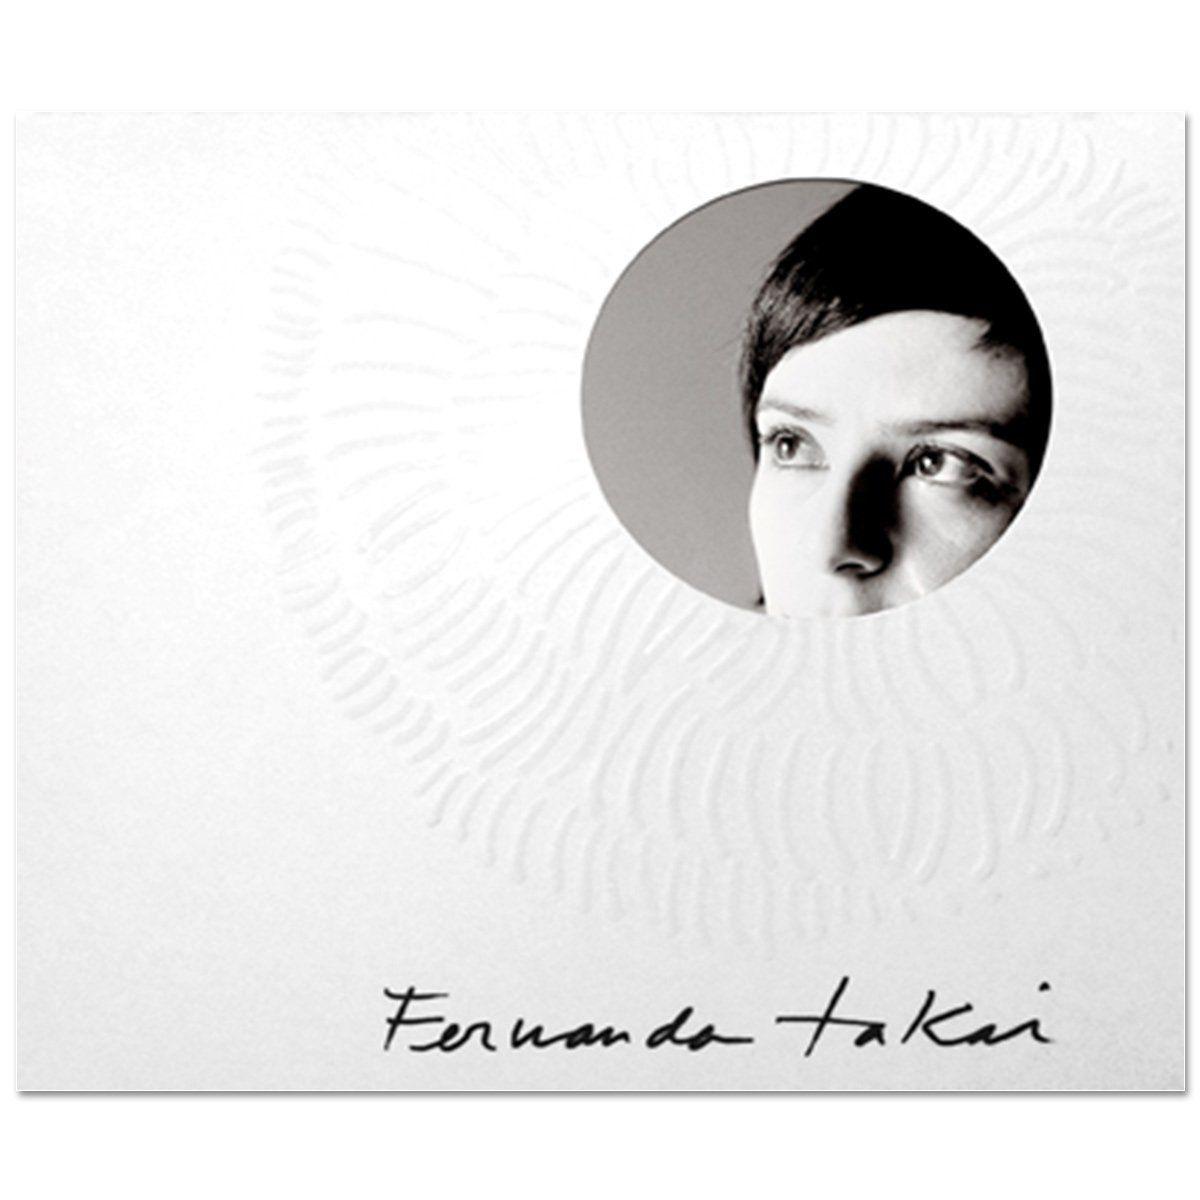 LP Fernanda Takai Onde Brilhem Os Olhos Seus  - bandUP Store Marketplace